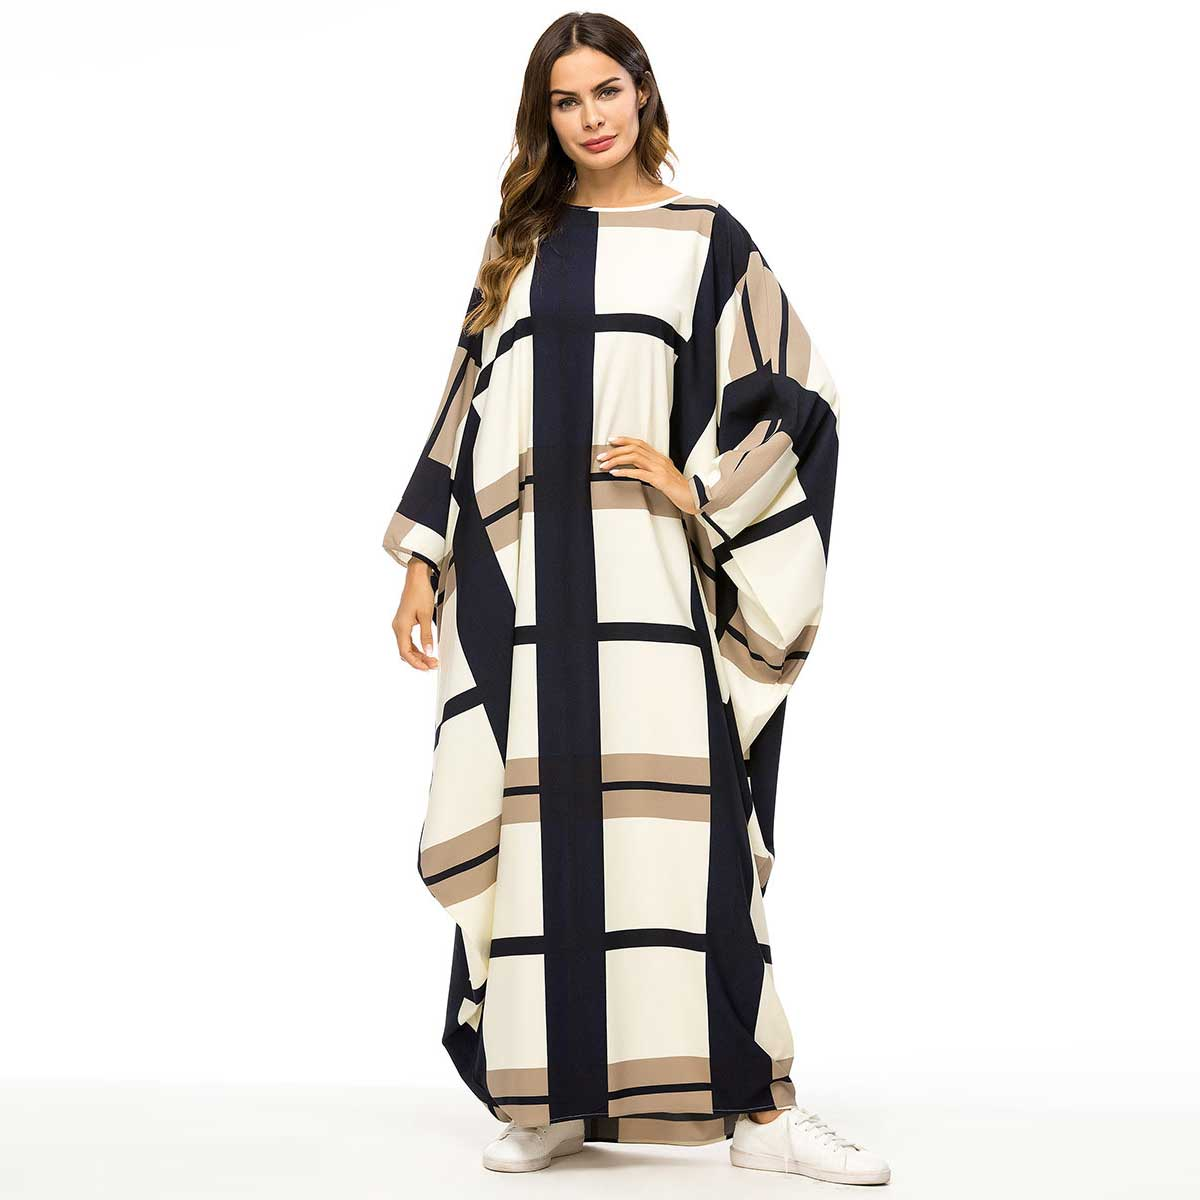 2019 Bat Shape Dress Gowns For Women Fashion Plaid Color Block Muslim Robes Oversized Bat Sleeve Maxi Vestidos Big Size VKDR1457